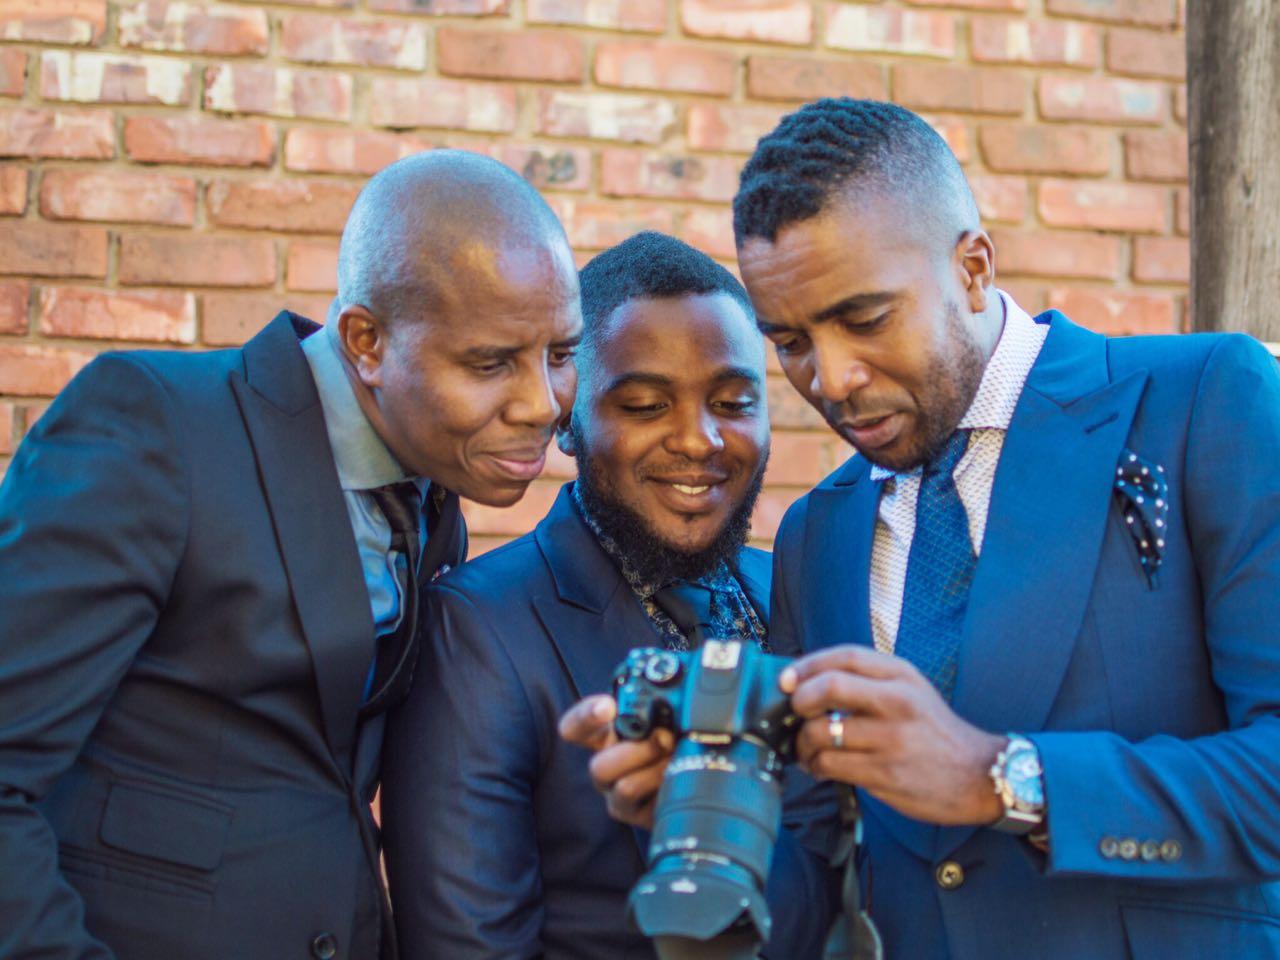 Losmeicherie Bespoke Tailor Suits Services Pretoria